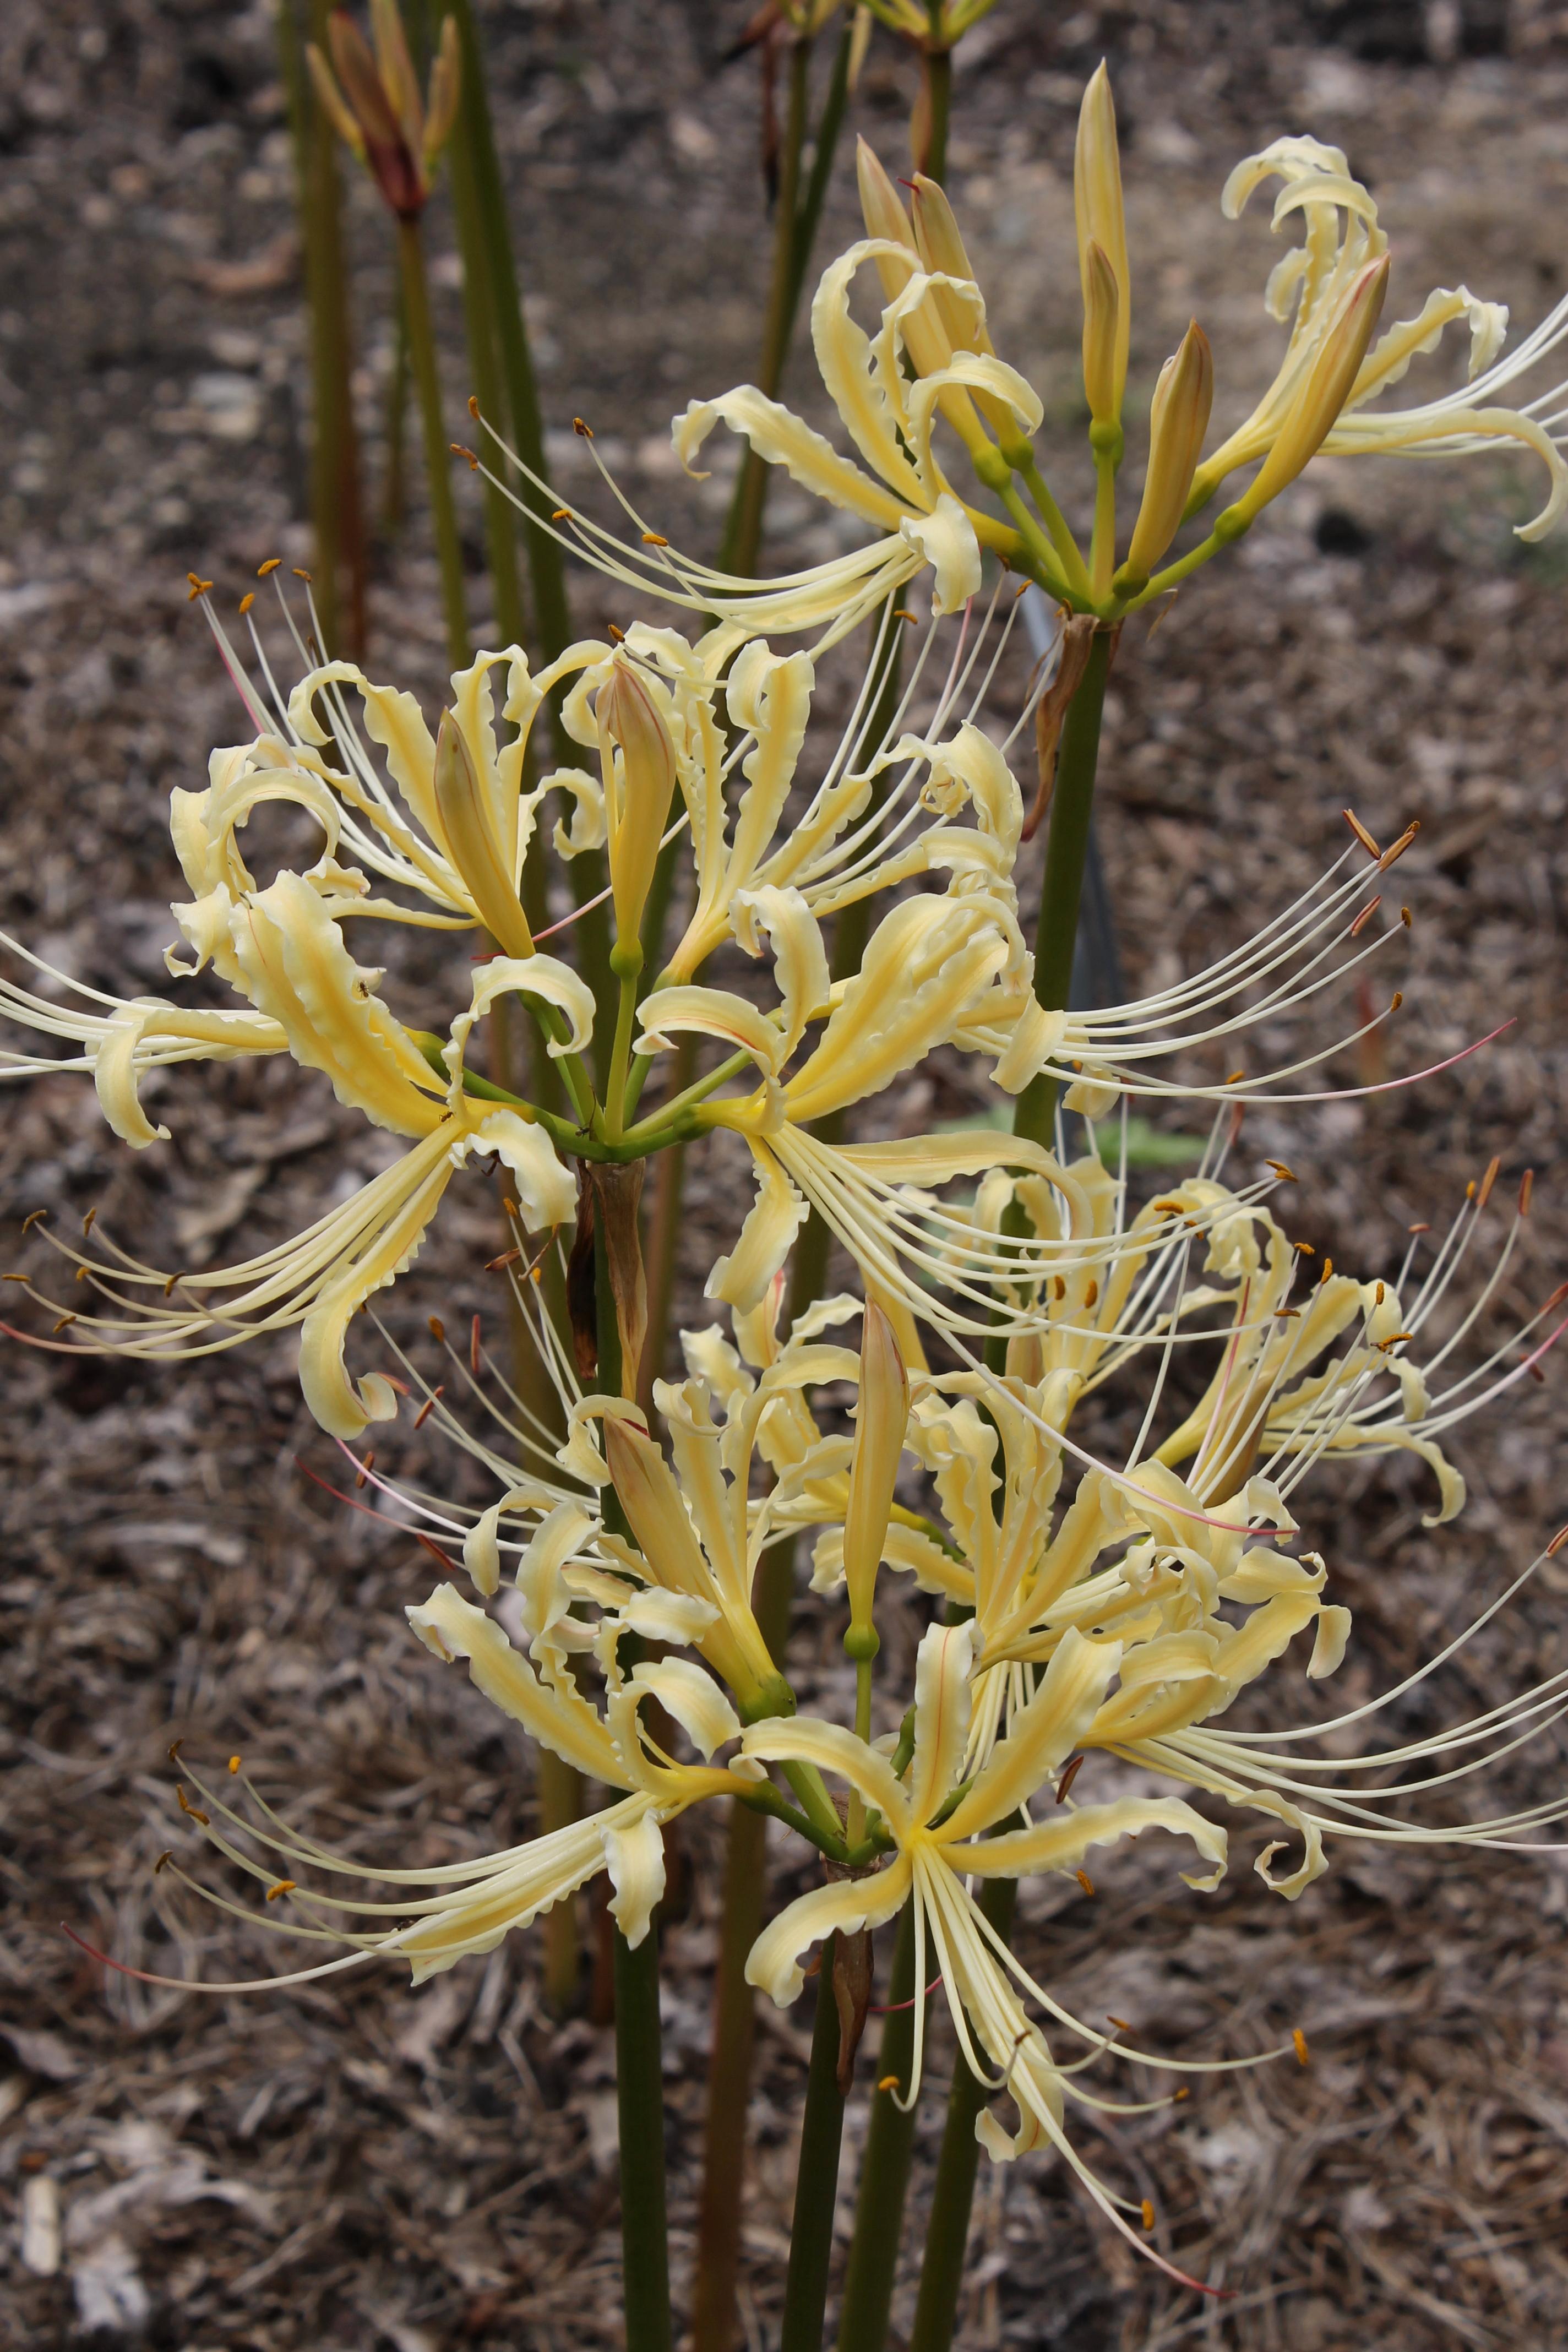 Lycoris x straminea 'Tie a Yellow Ribbon' @ JLBG - a PDN/JLBG selection of a hybrid of Lycoris radiata var. pumila x chinensis from a Chinese Nursery bulb import